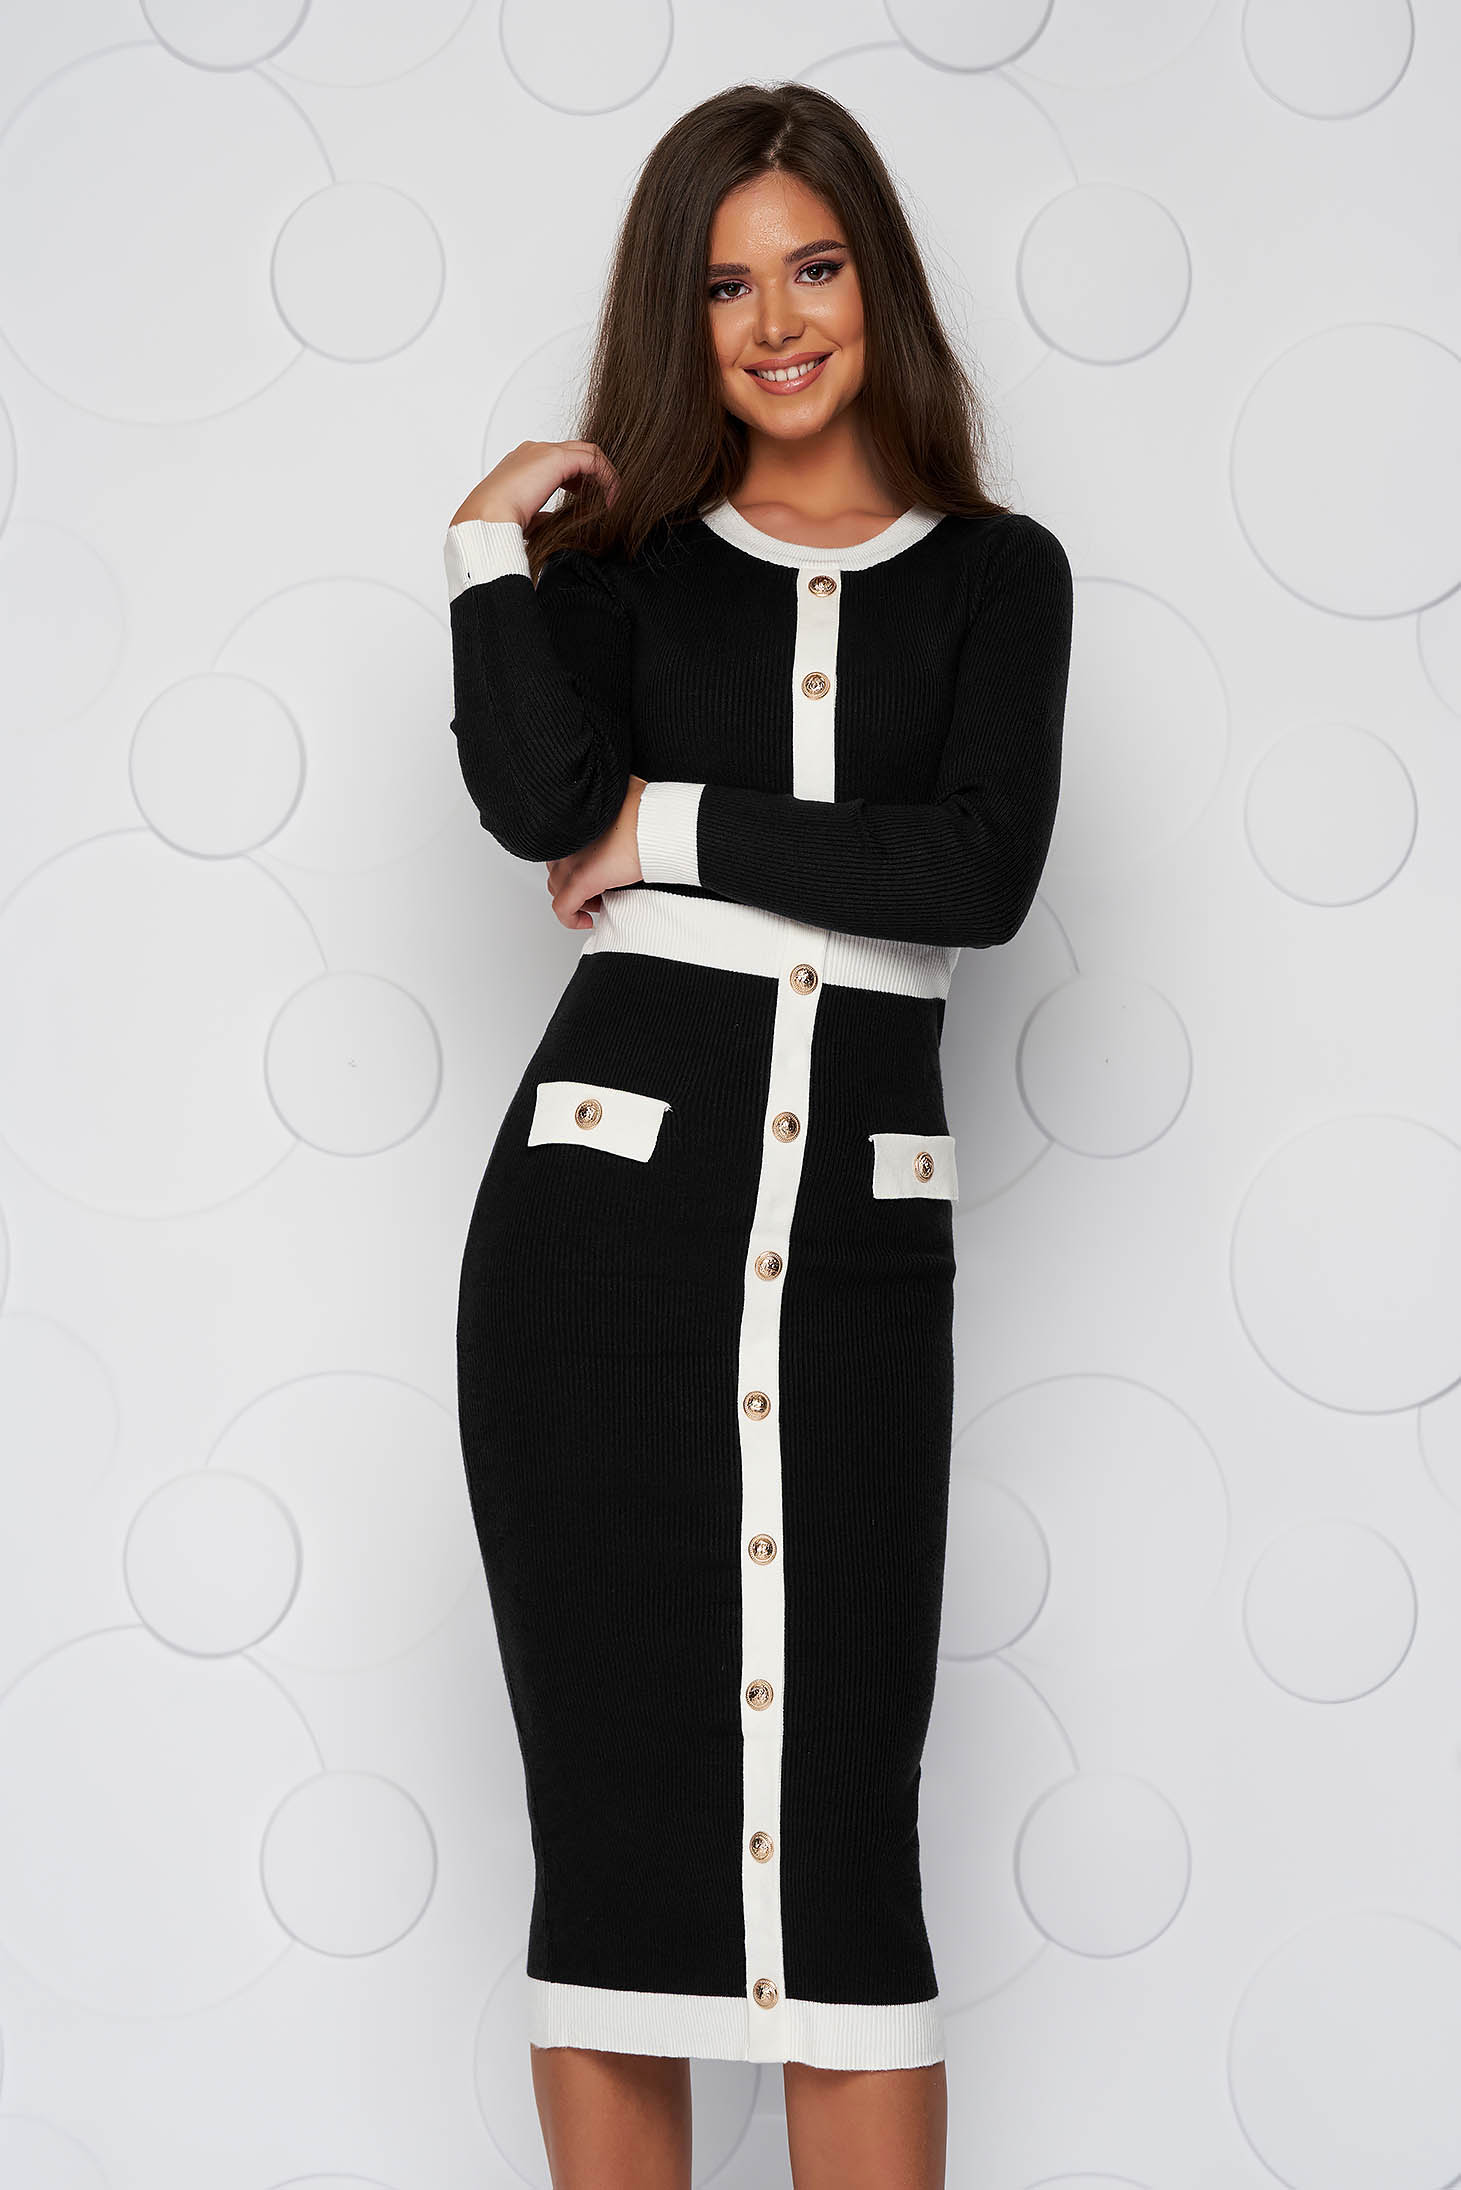 Rochie SunShine neagra midi tip creion din material tricotat accesorizata cu nasturi cu buzunare false